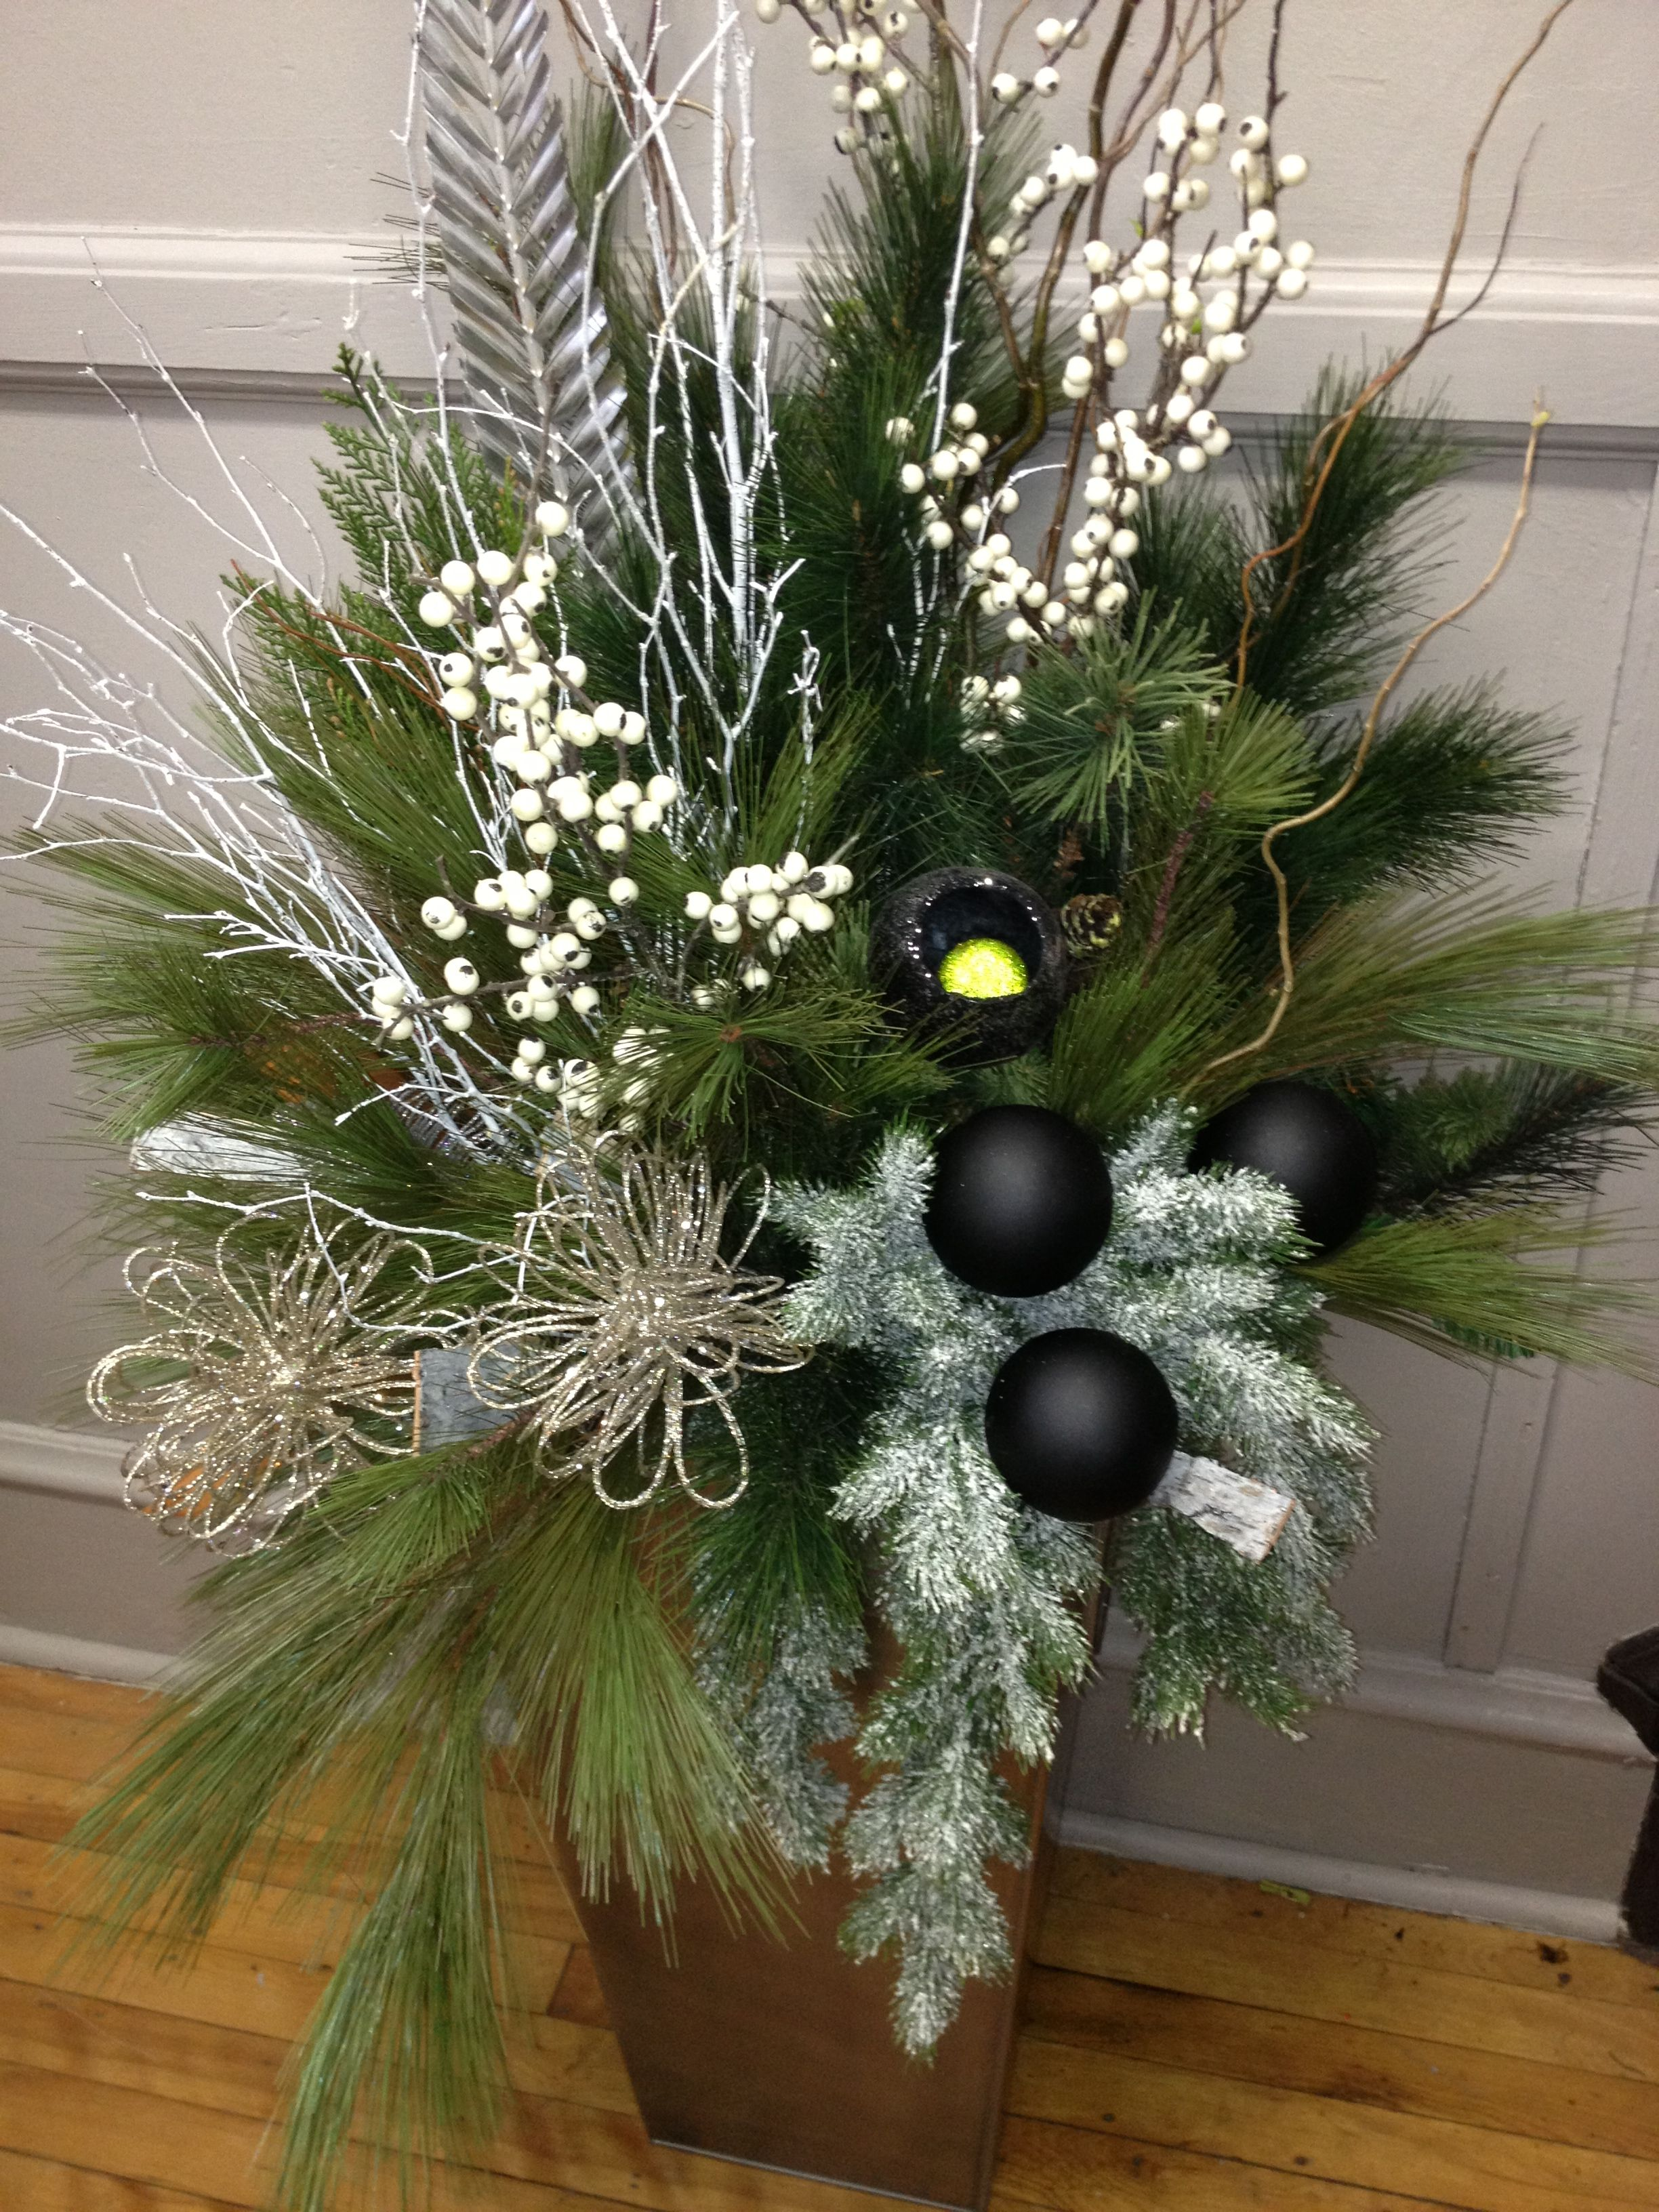 Classy Christmas, modern Urn Arrangement | Christmas ...